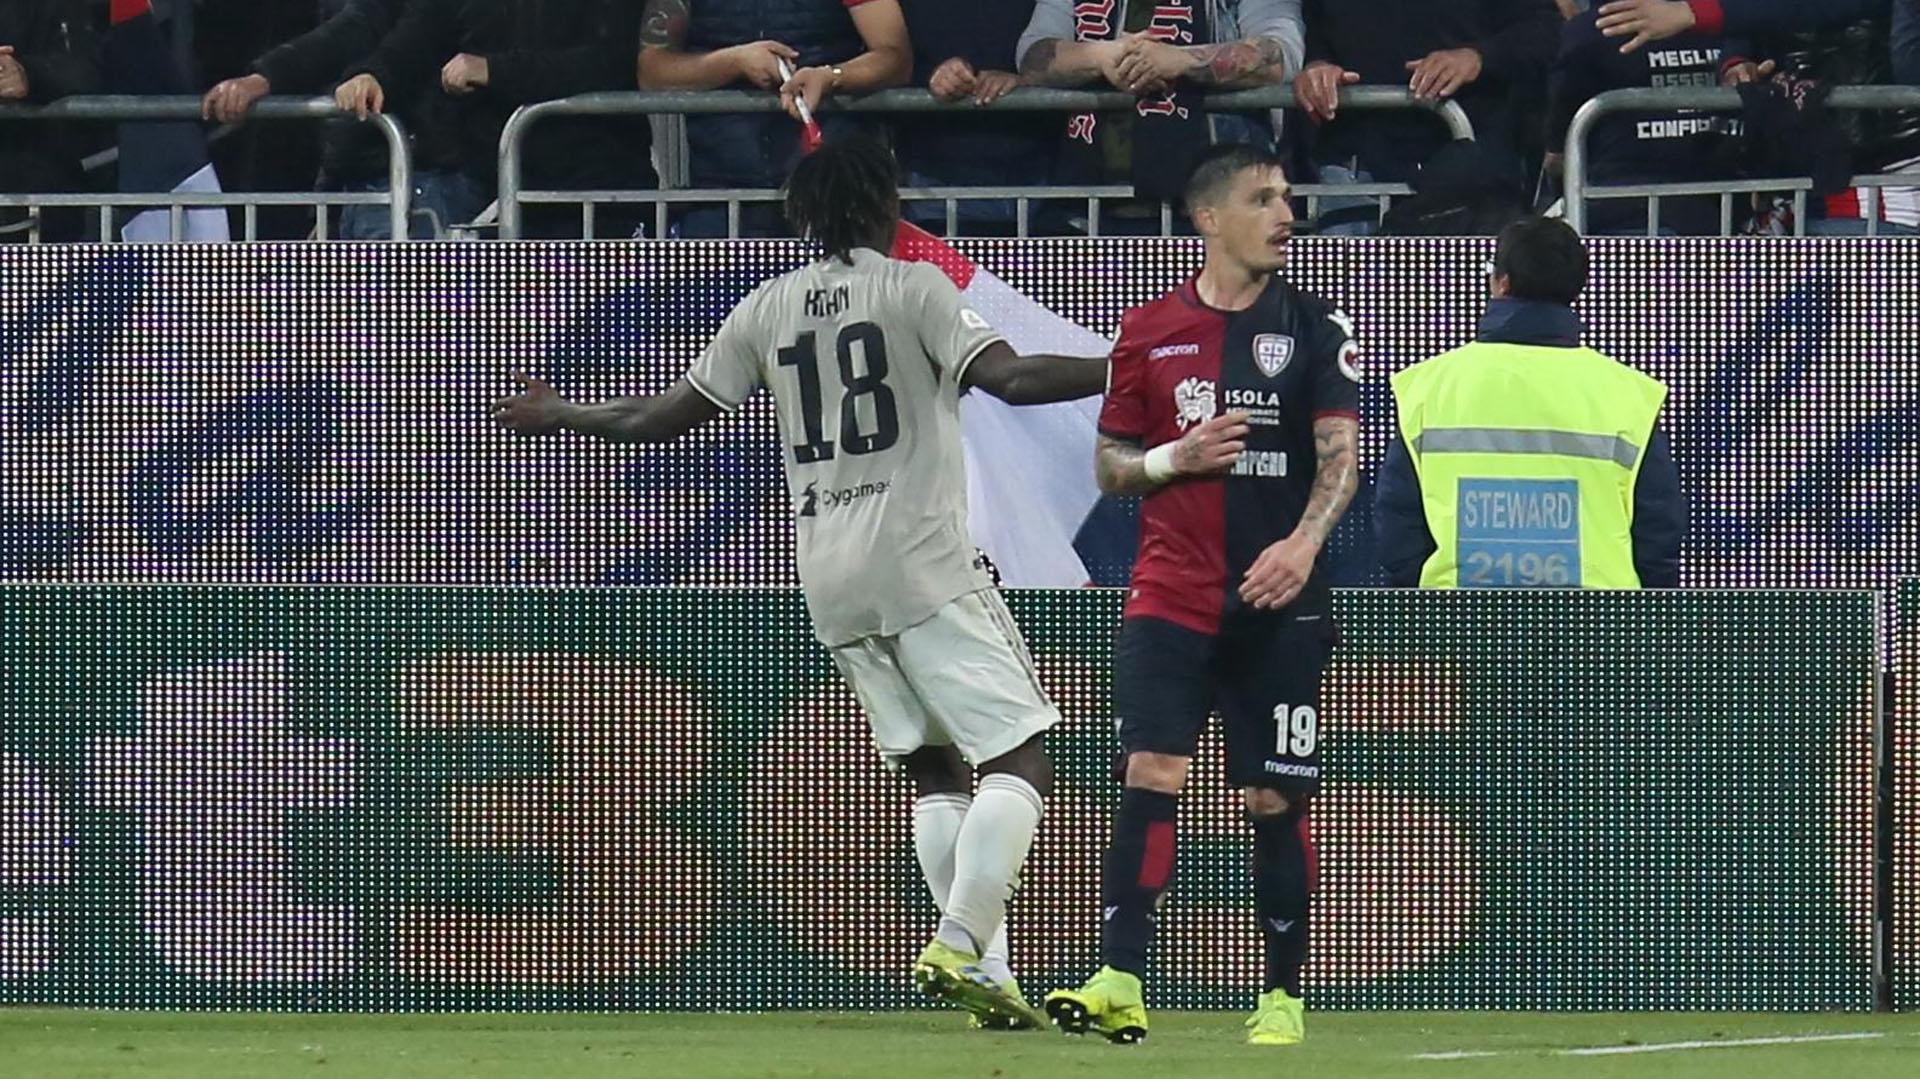 Moise Kean, joven promesa de la Juventus, festeja su gol ante Cagliari (EFE)